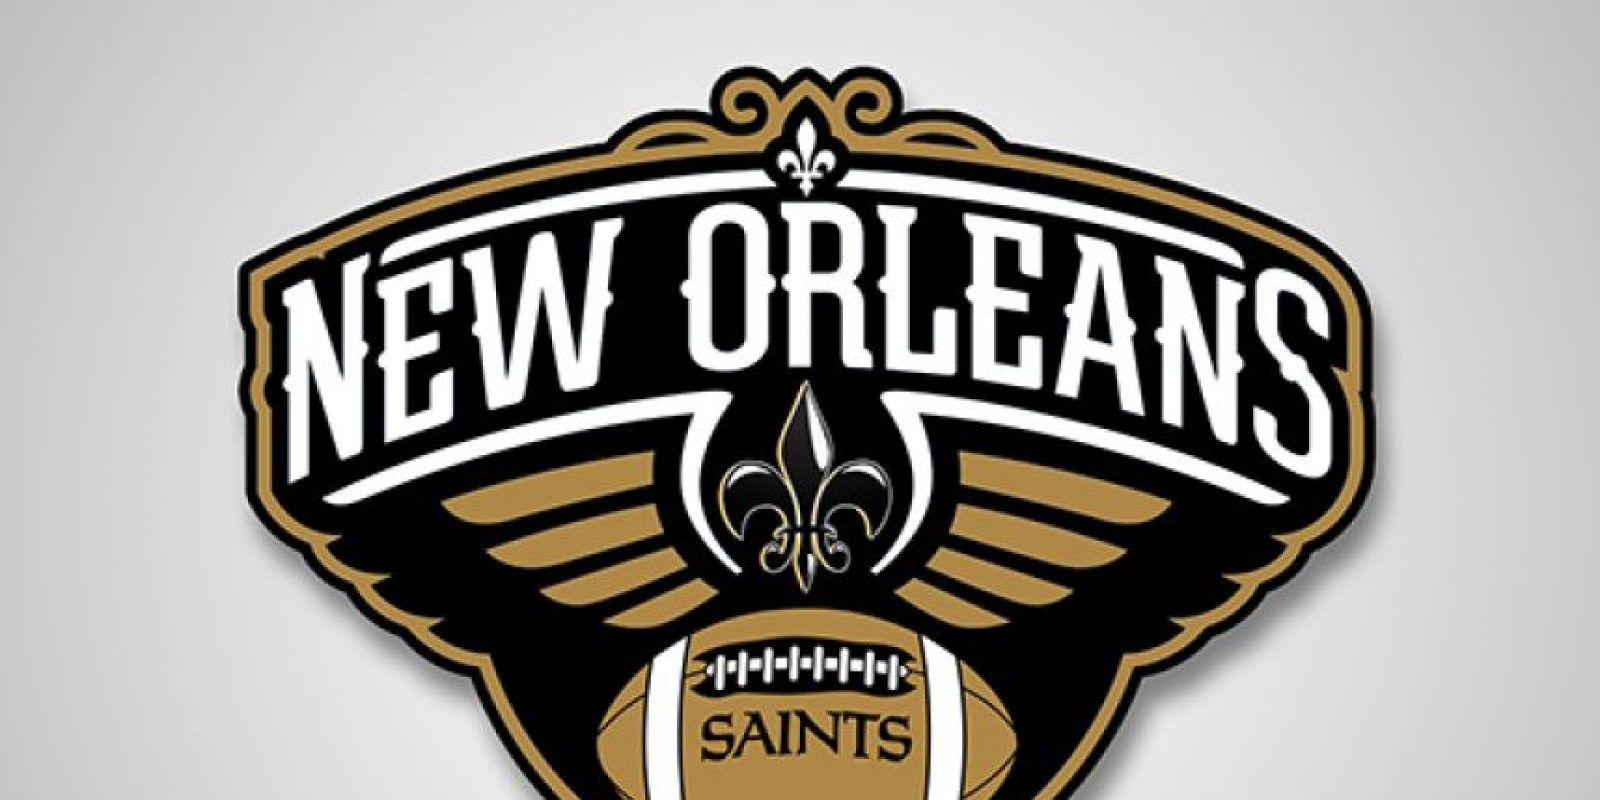 New Orleans Pelicans y New Orleans Saints Foto:DaylySnark